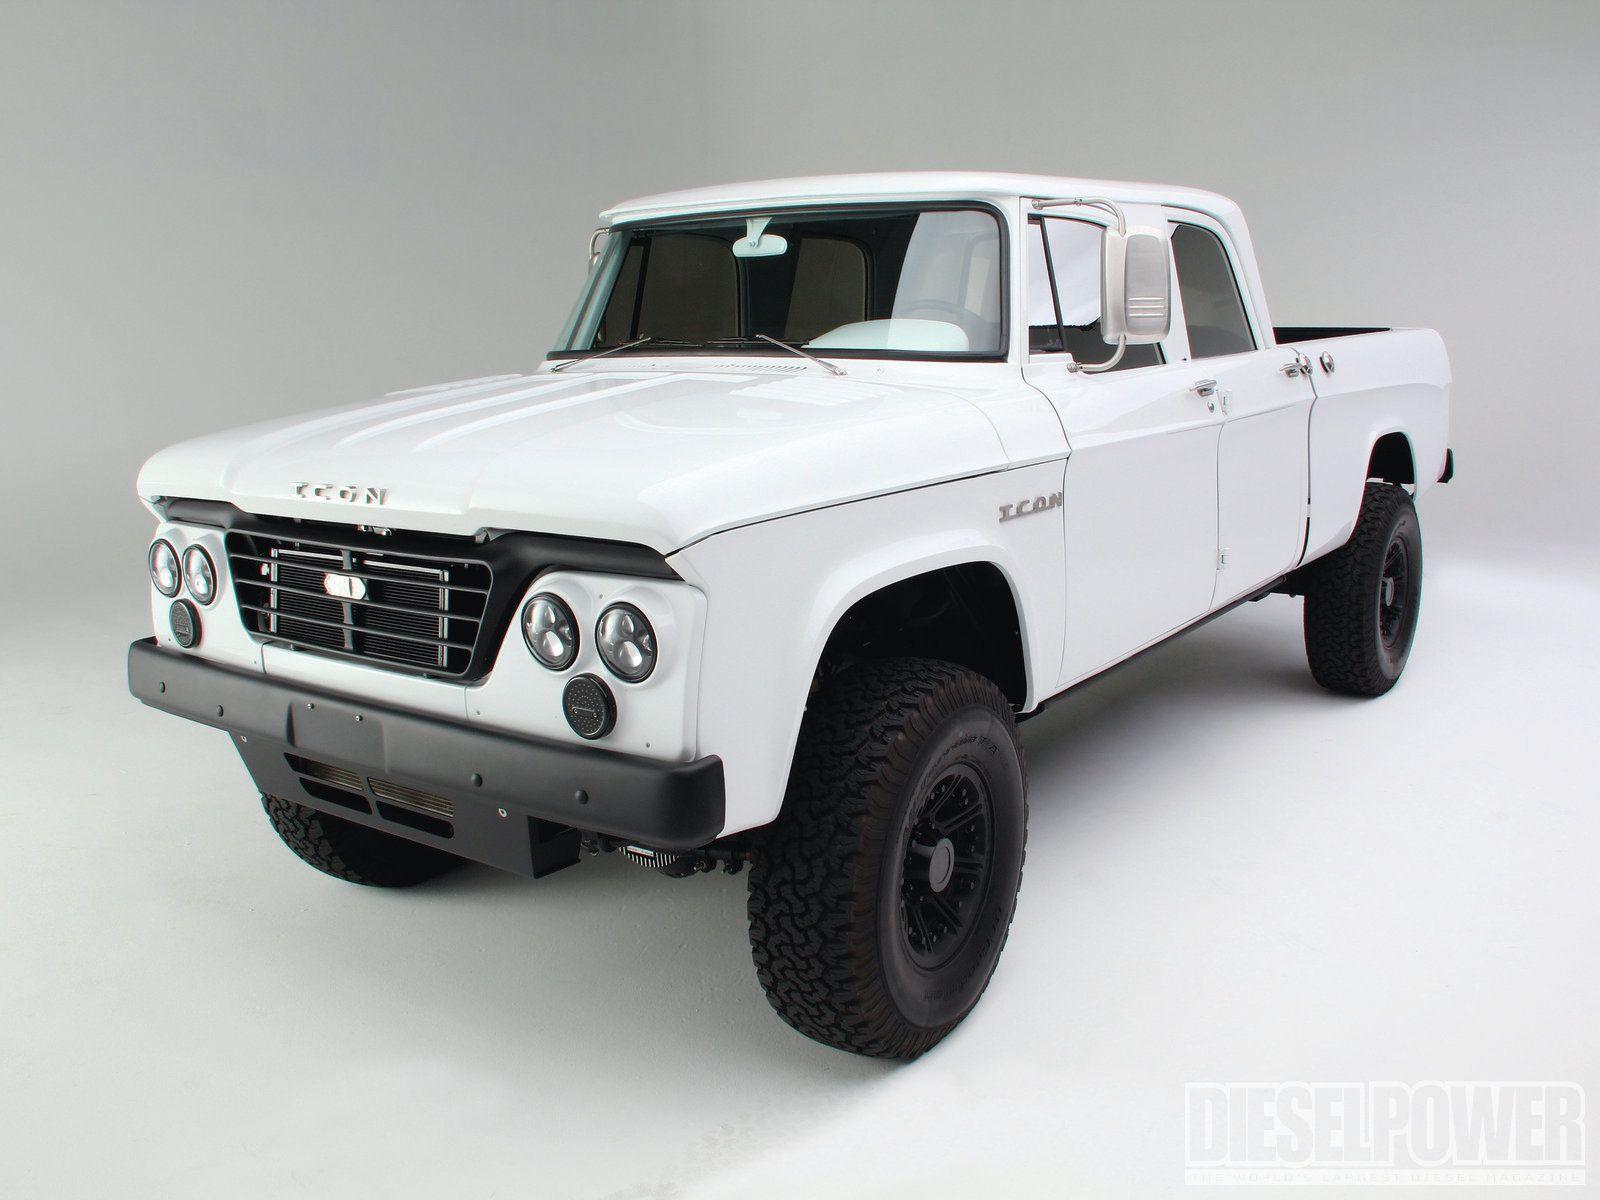 1965 icon dodge diesel power magazine icon makes some amazing vehicles